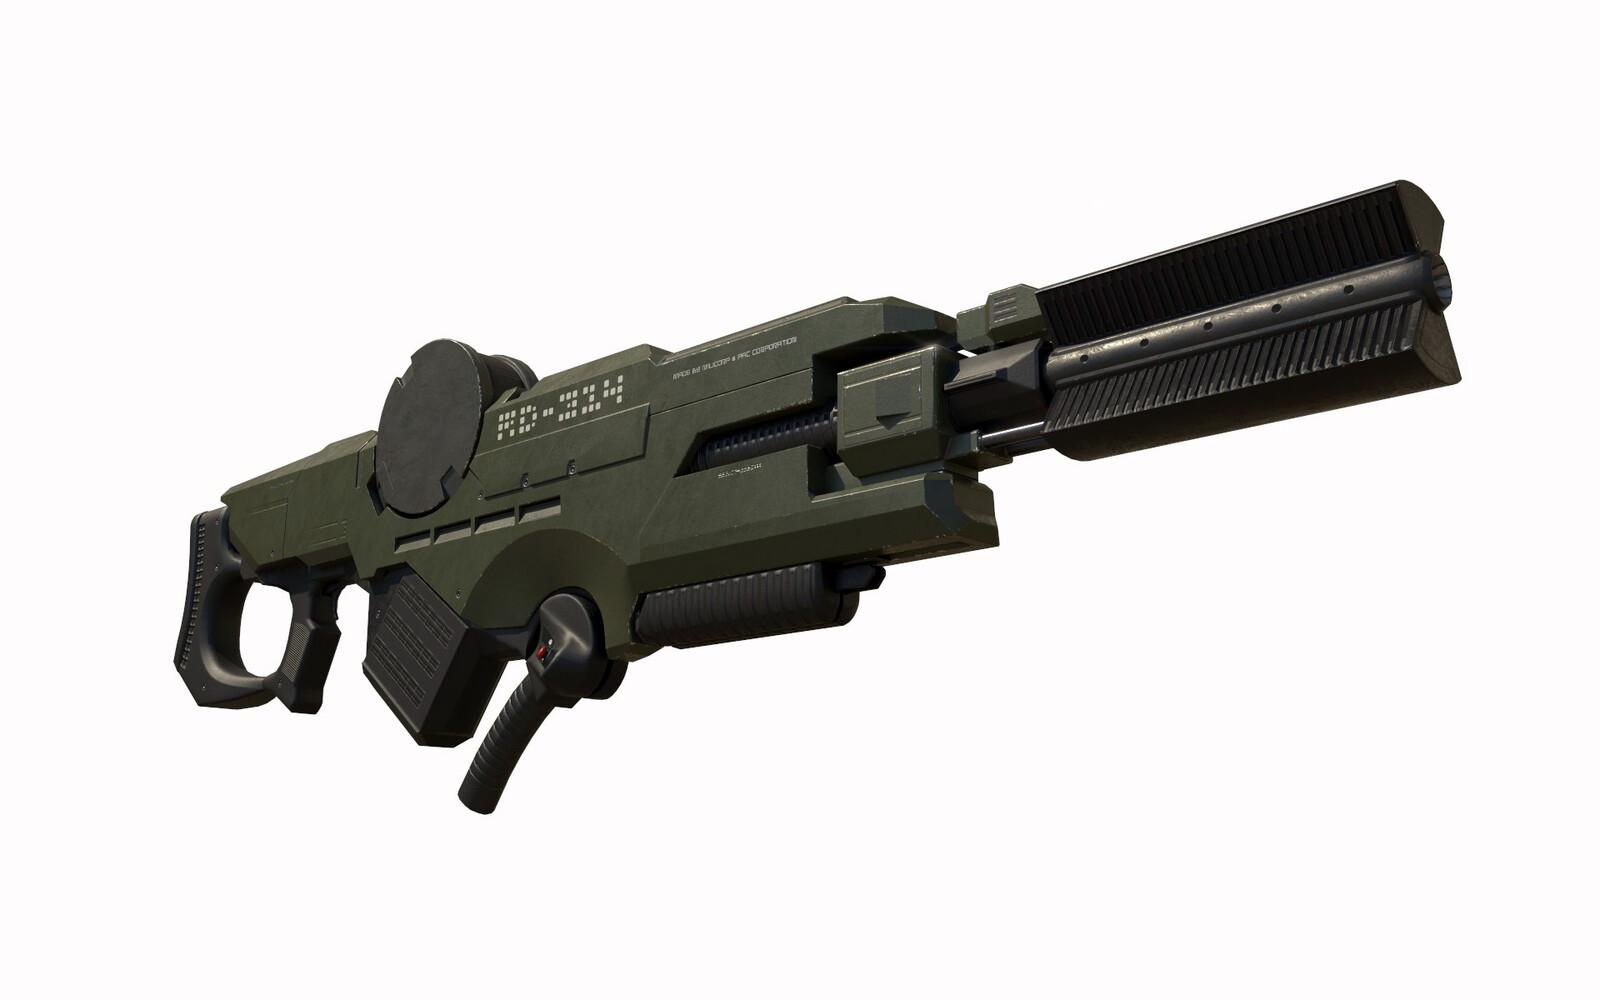 Sci-Fi Heavy Rifle